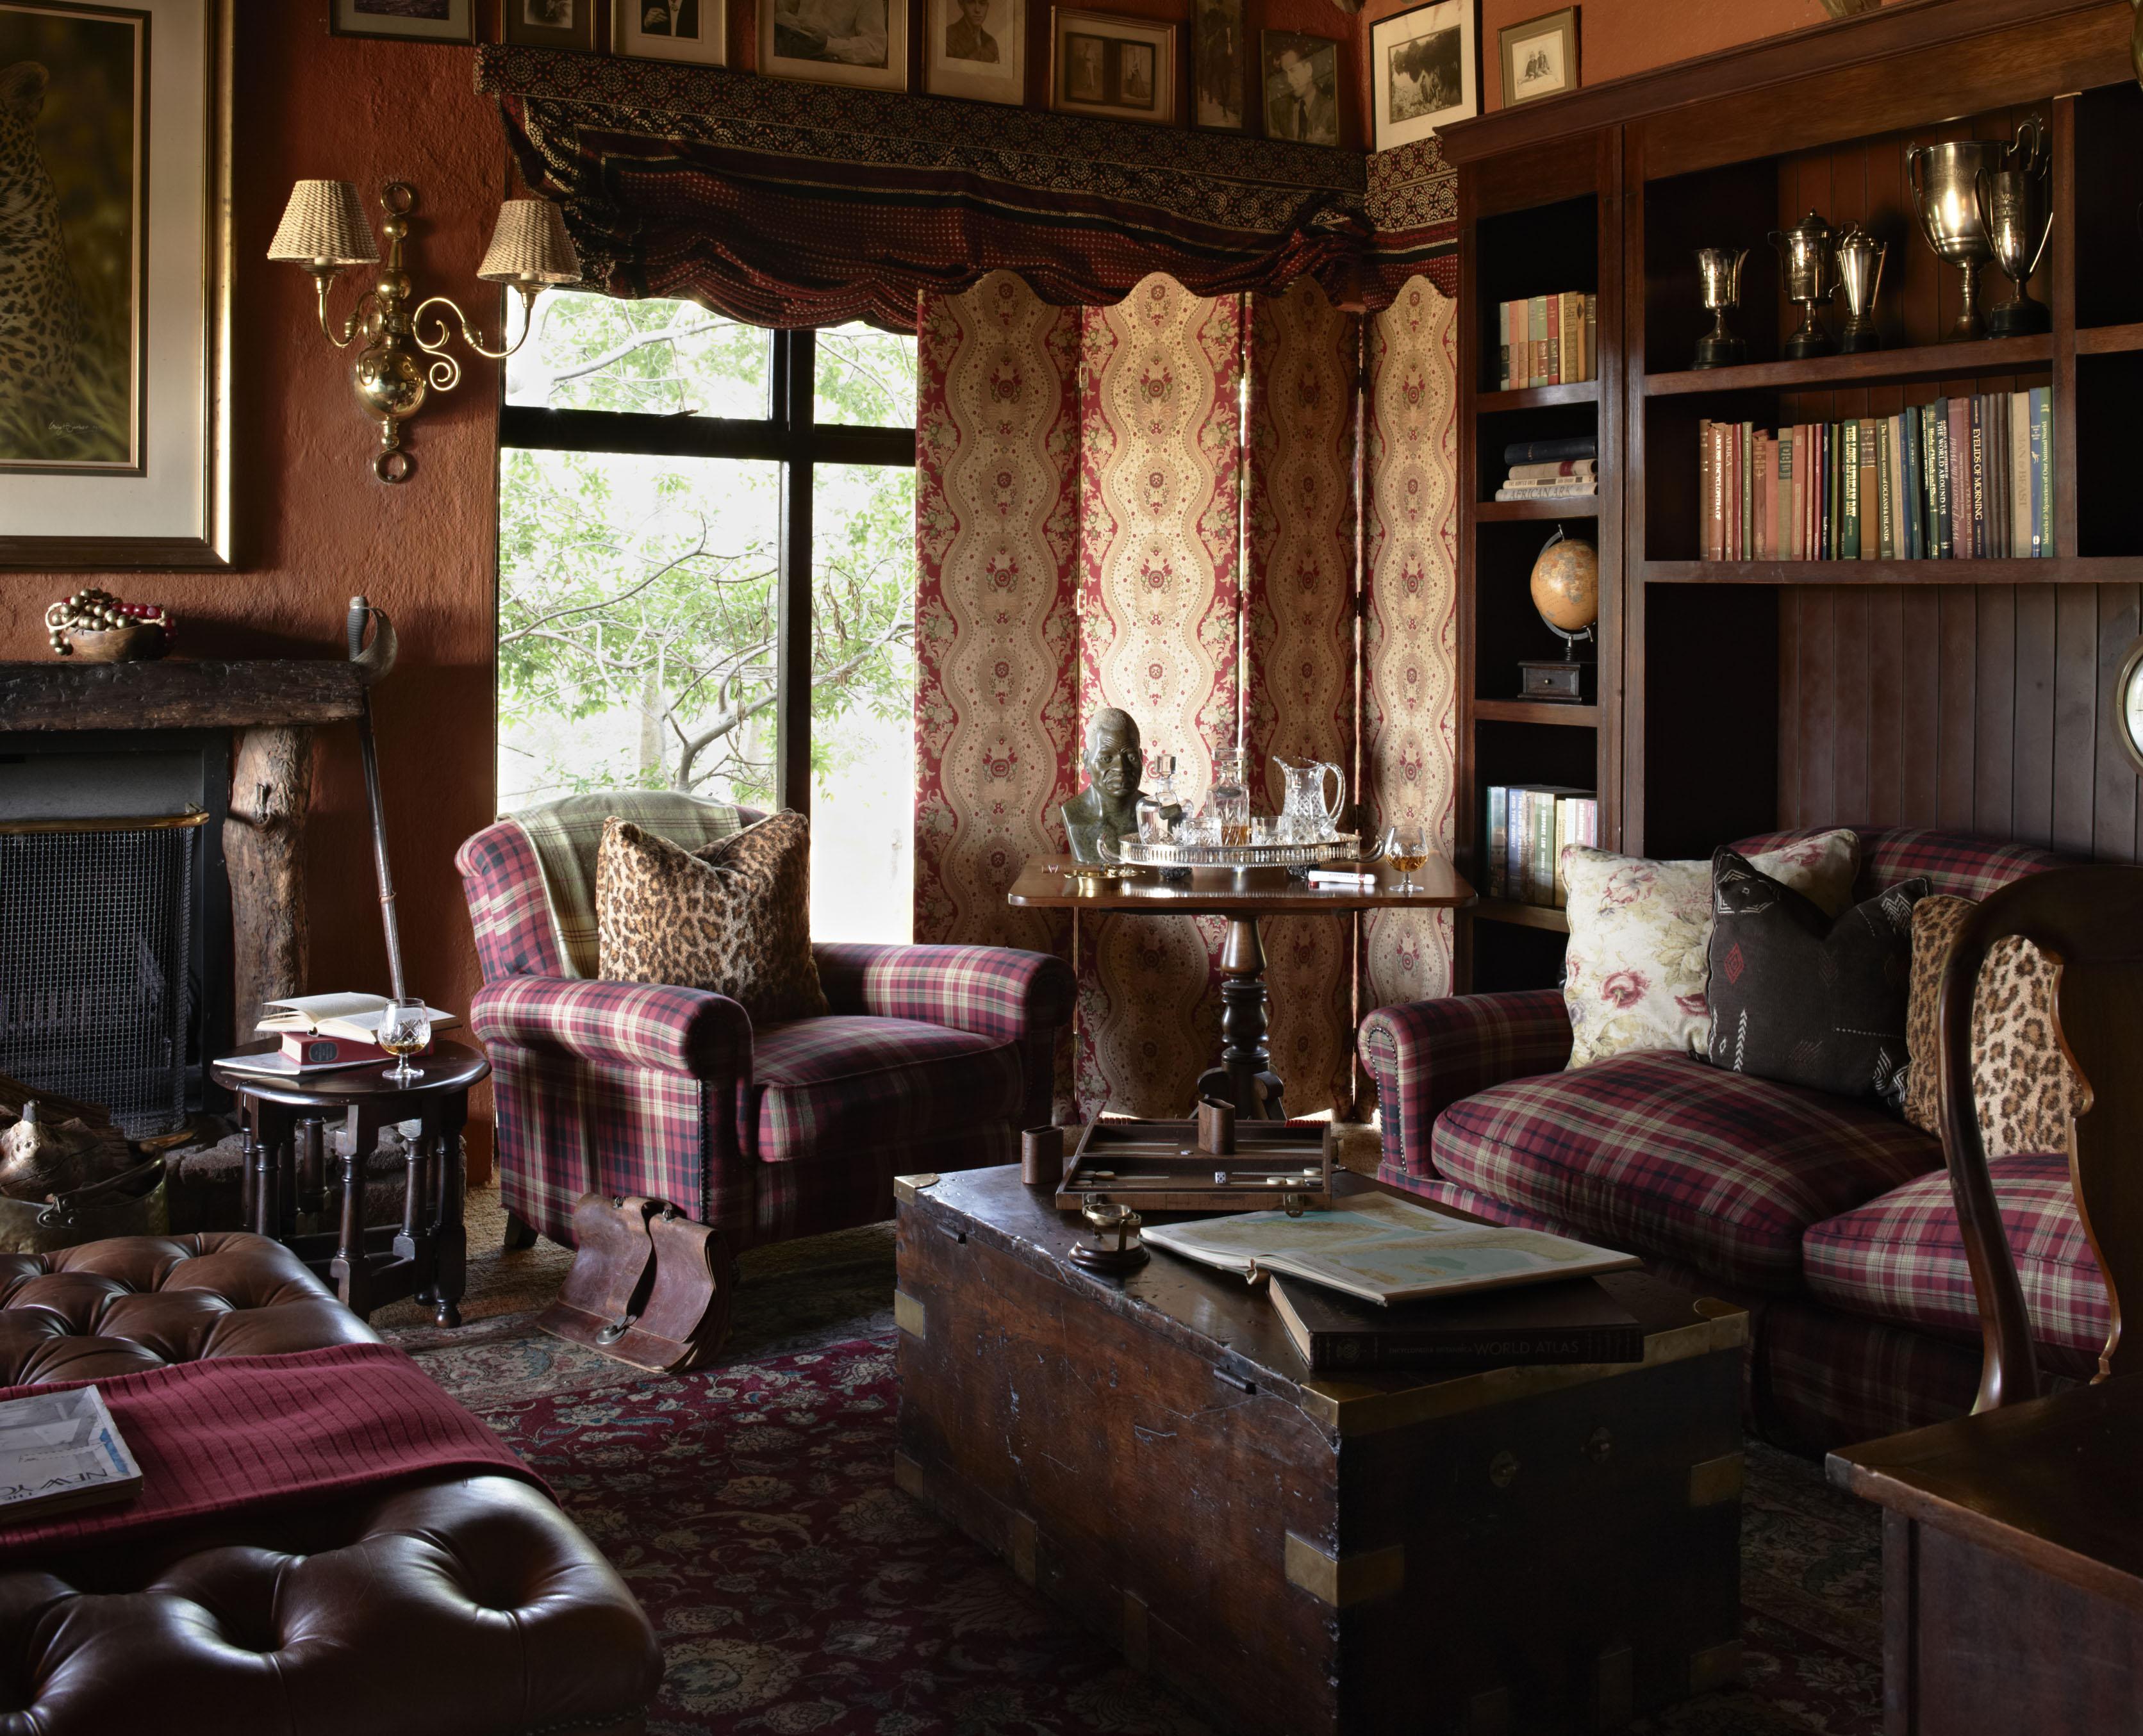 old fashioned bedroom chairs that swivel and recline a singita safari at ebony lodge swain destinations